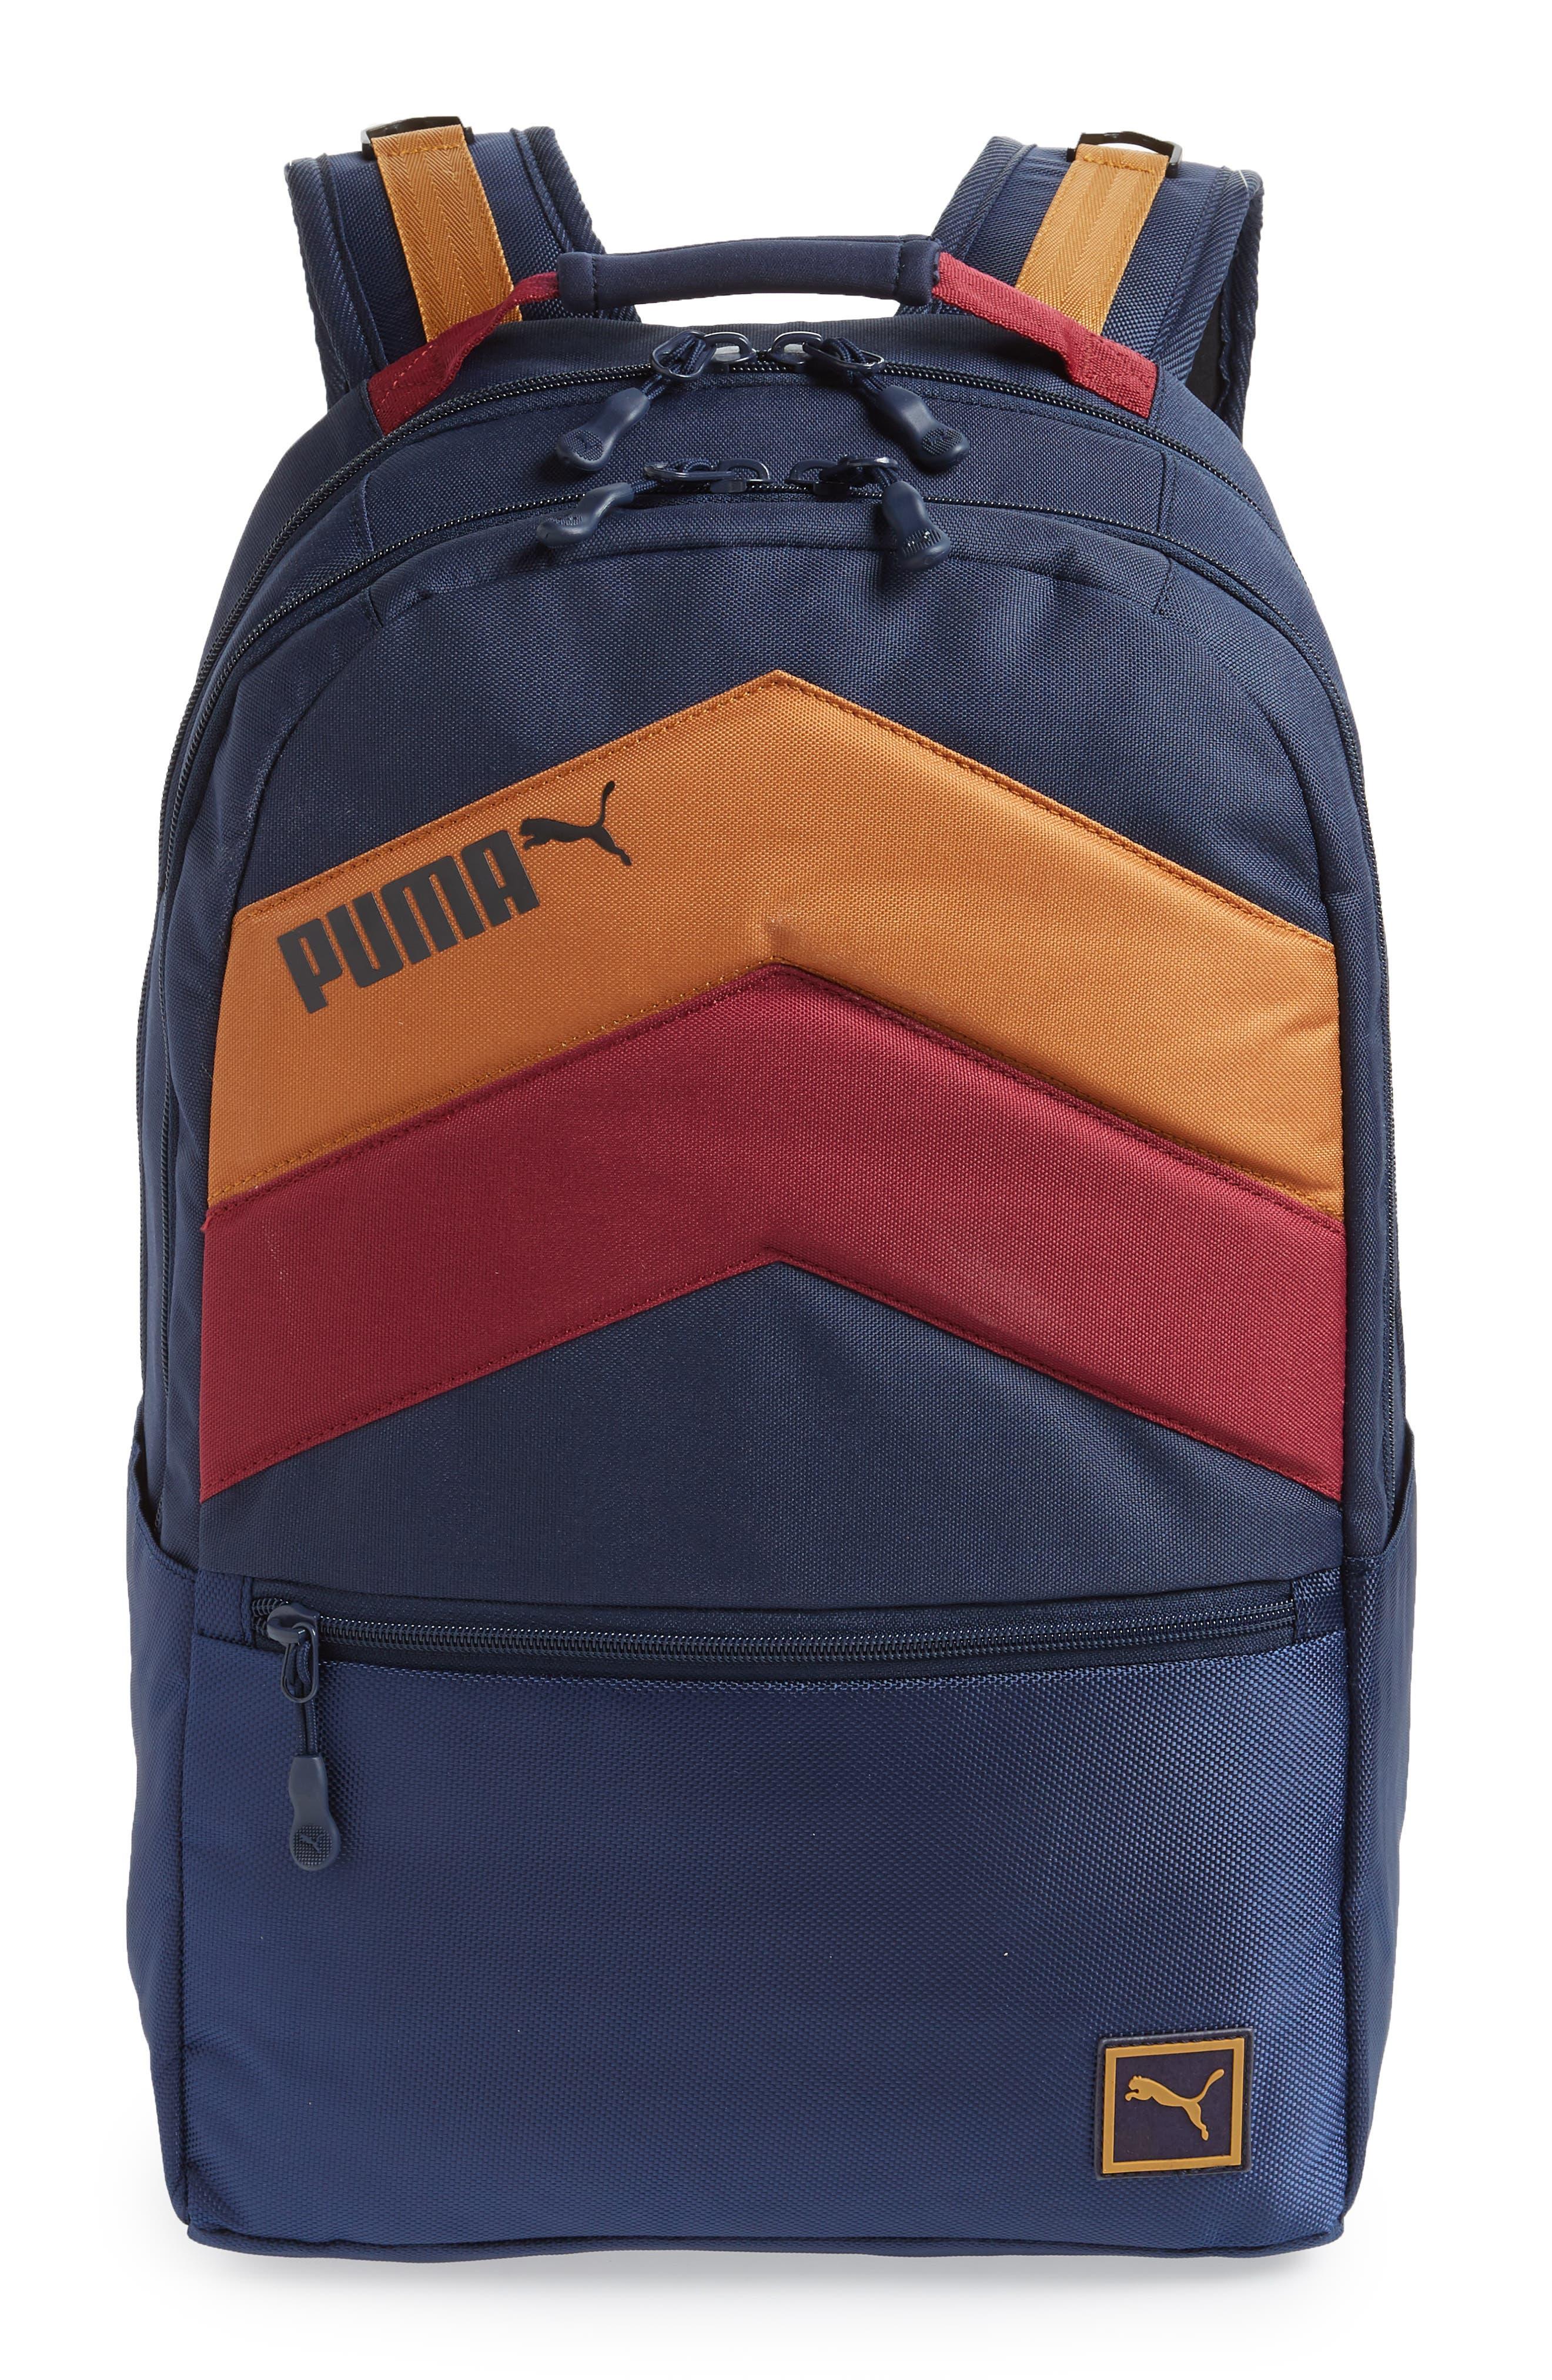 PUMA Ready Backpack, Main, color, NAVY